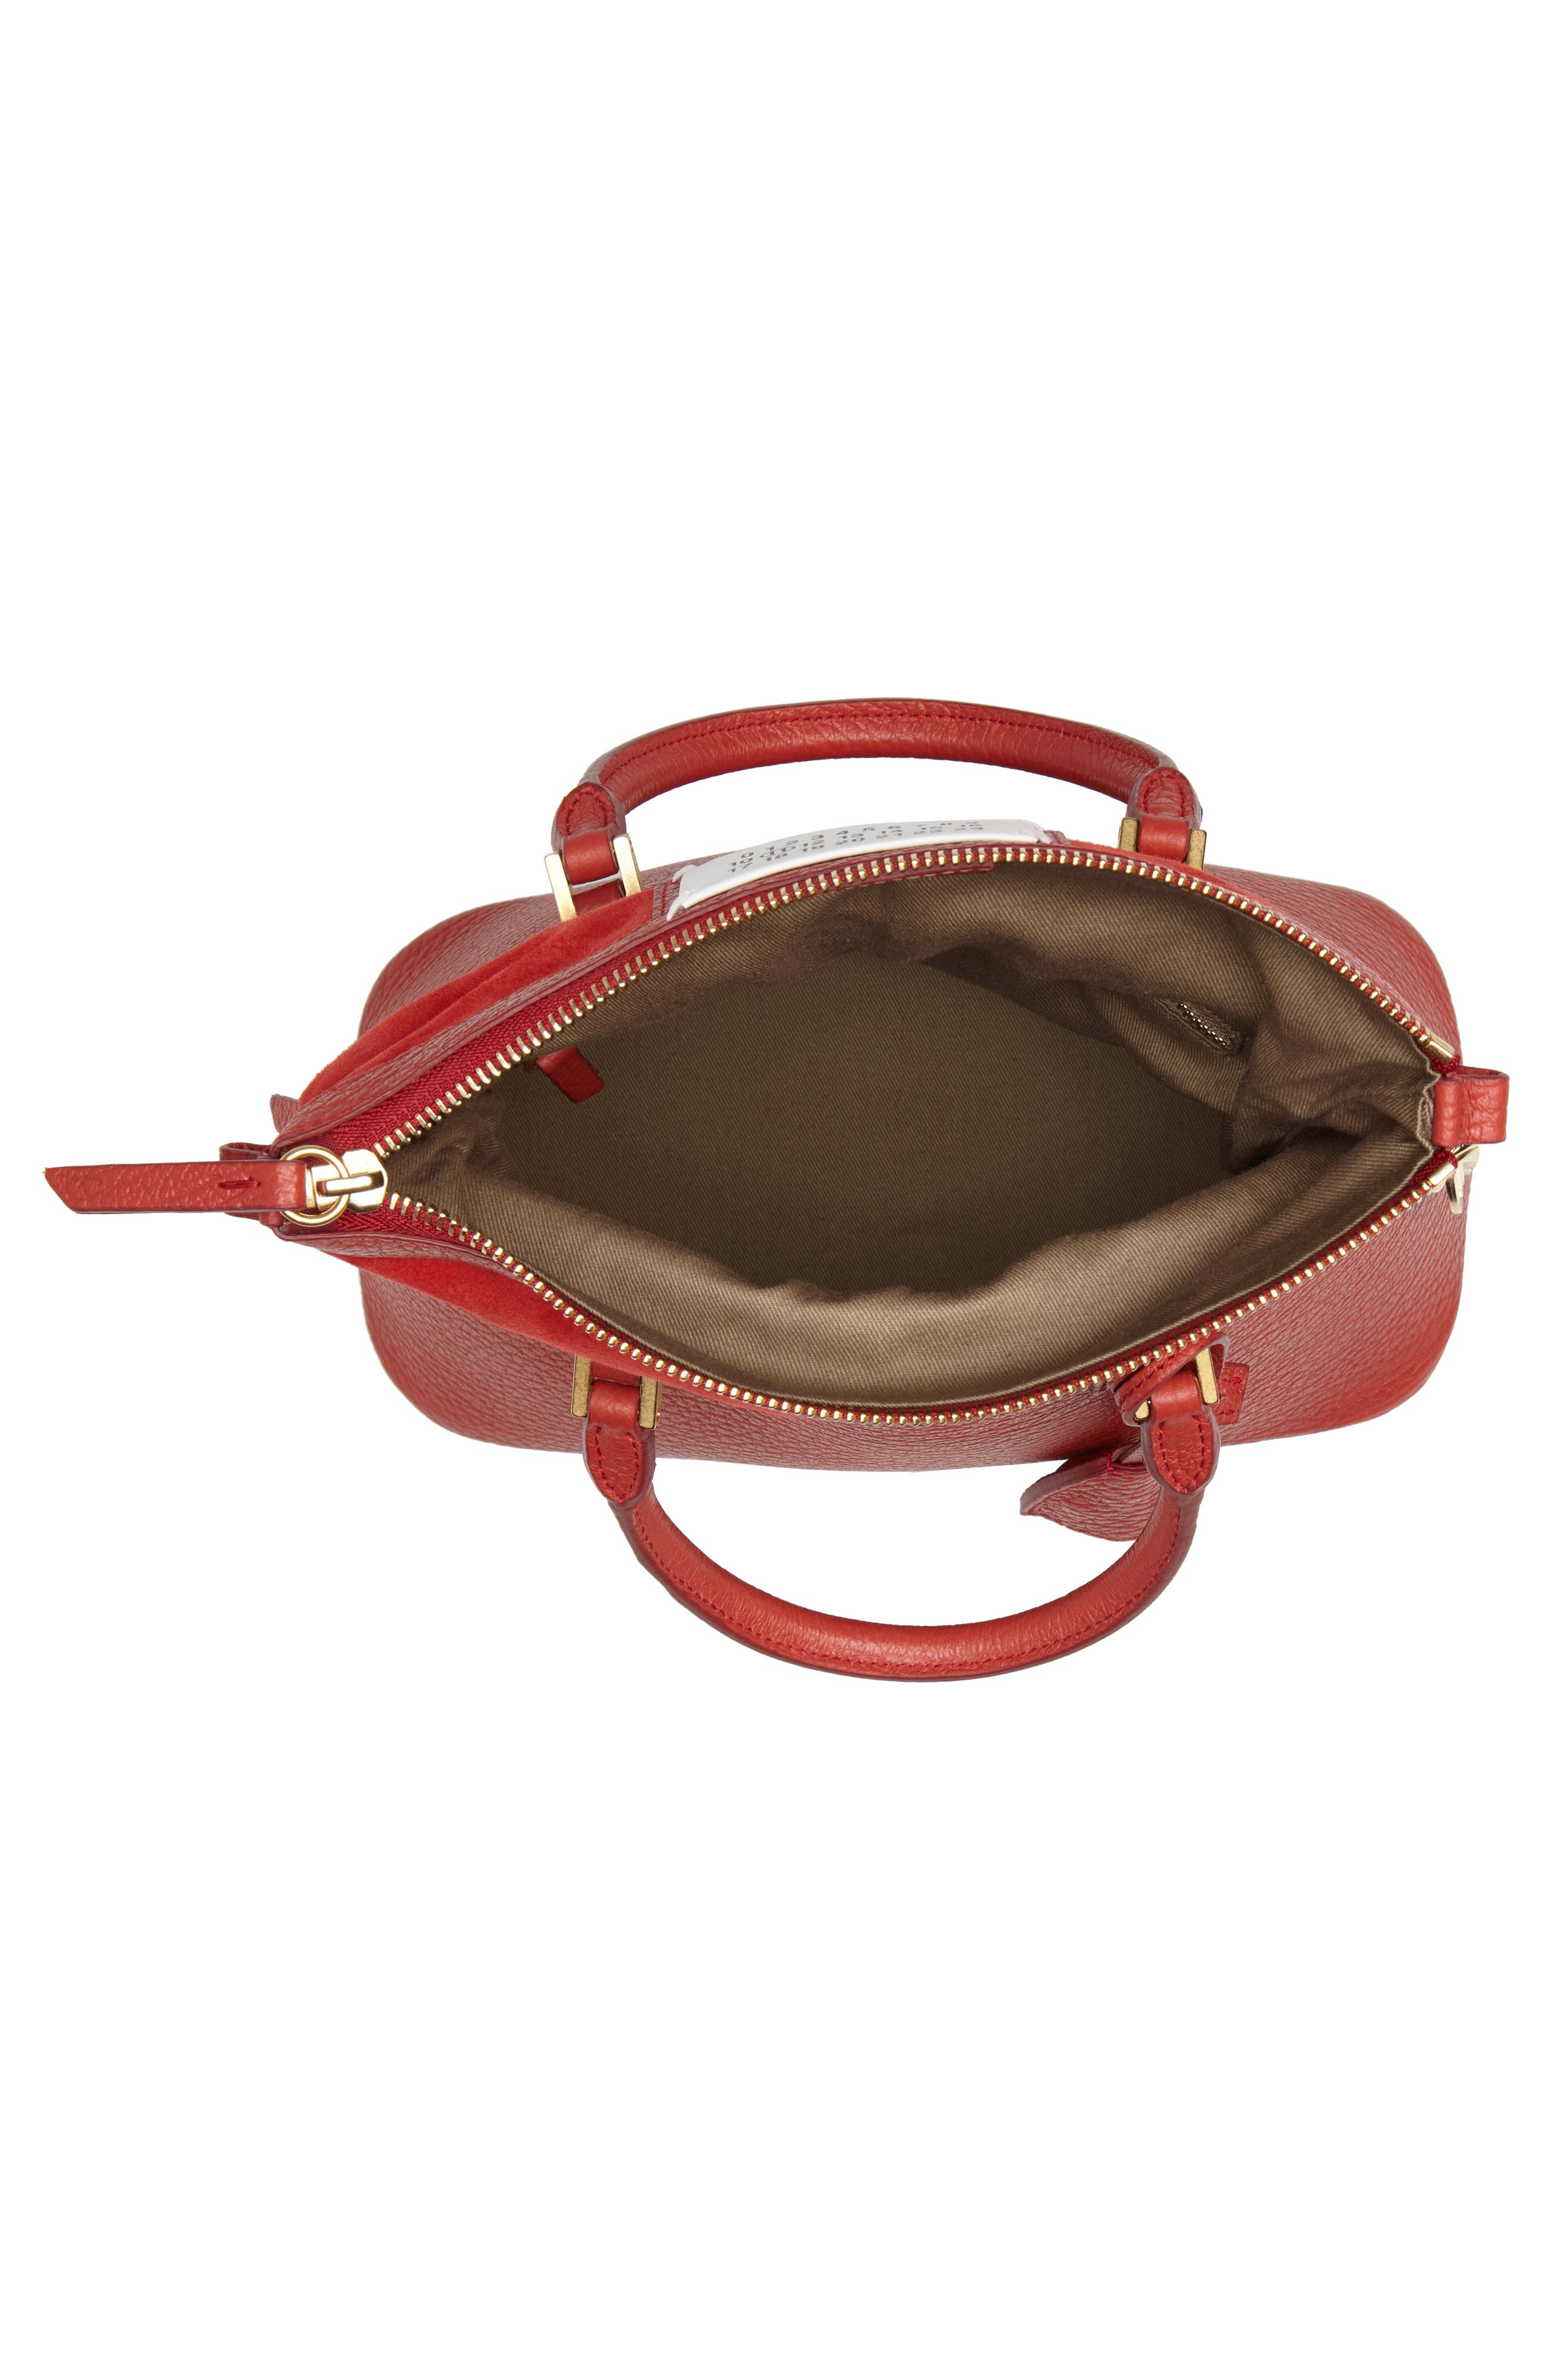 Small 5AC Calfskin Leather Handbag,                             Alternate thumbnail 5, color,                             600